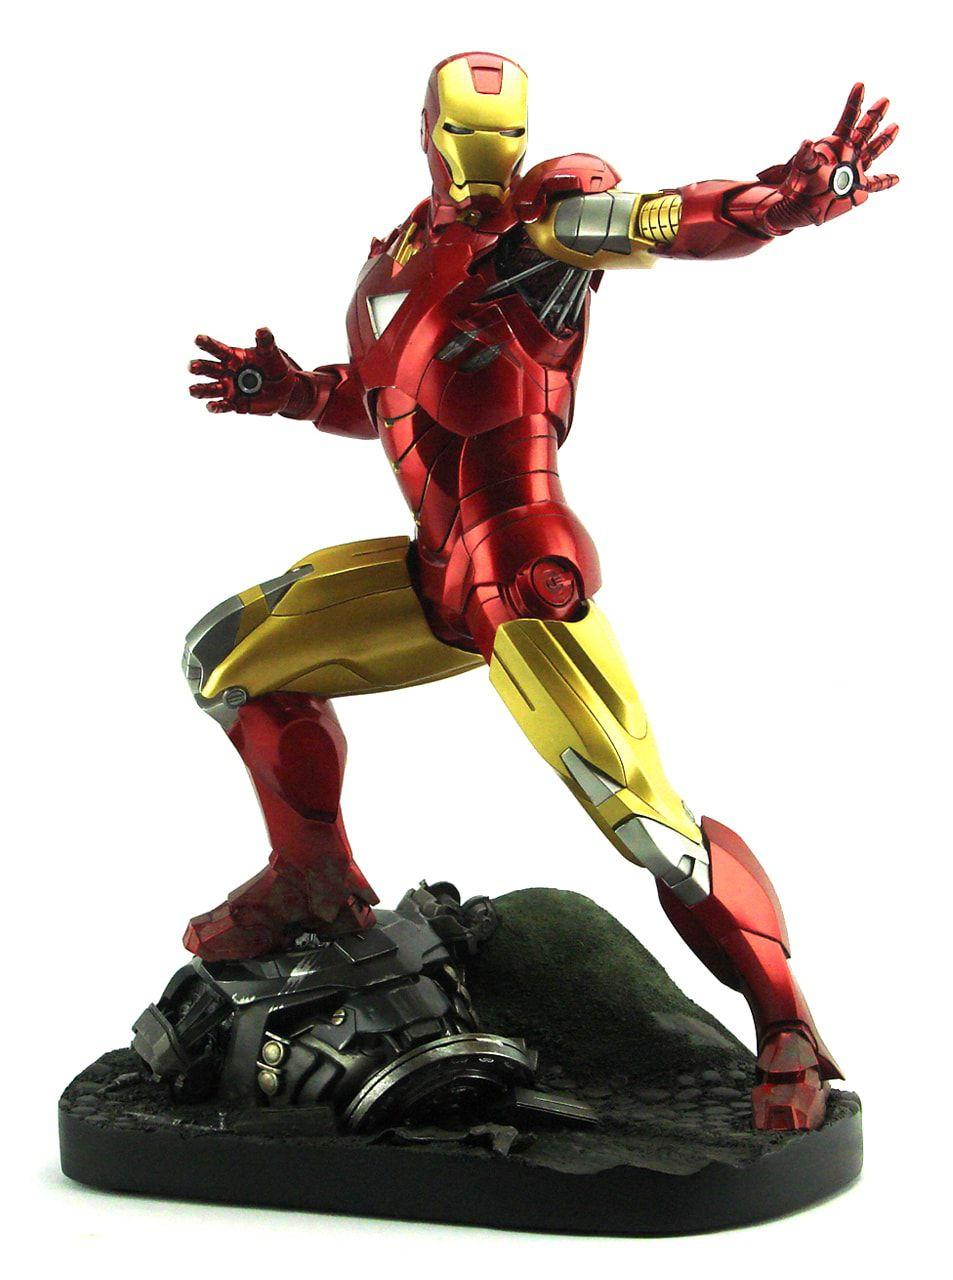 Estátua Homem de Ferro (Iron Man Mark VI) Maquette: Homem de Ferro 2 (Iron Man 2) - Sideshow Collectibles